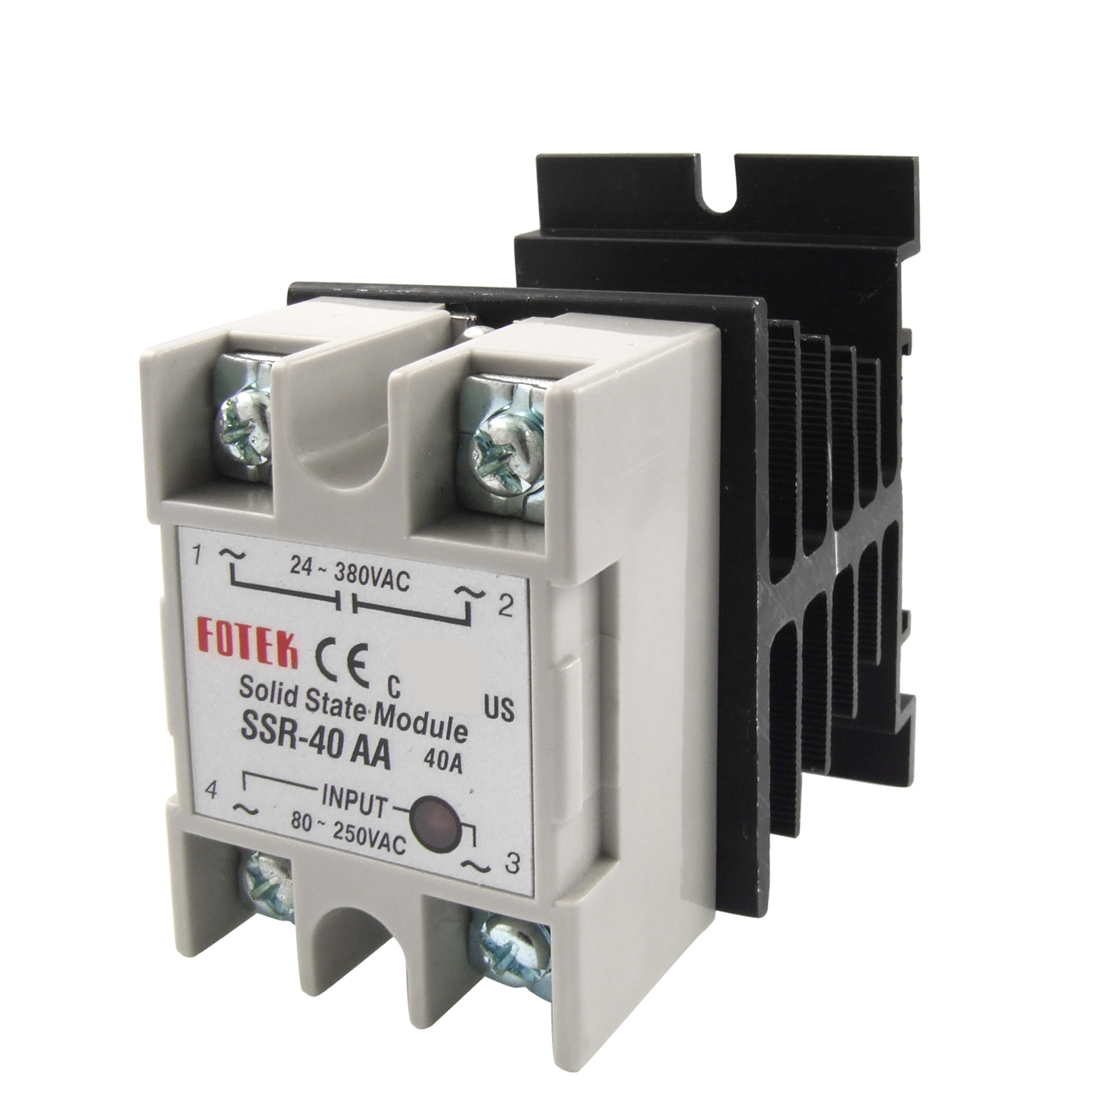 AC-AC Single Phase Solid State Relay SSR-40A 80-250V 24-380V w heat sink